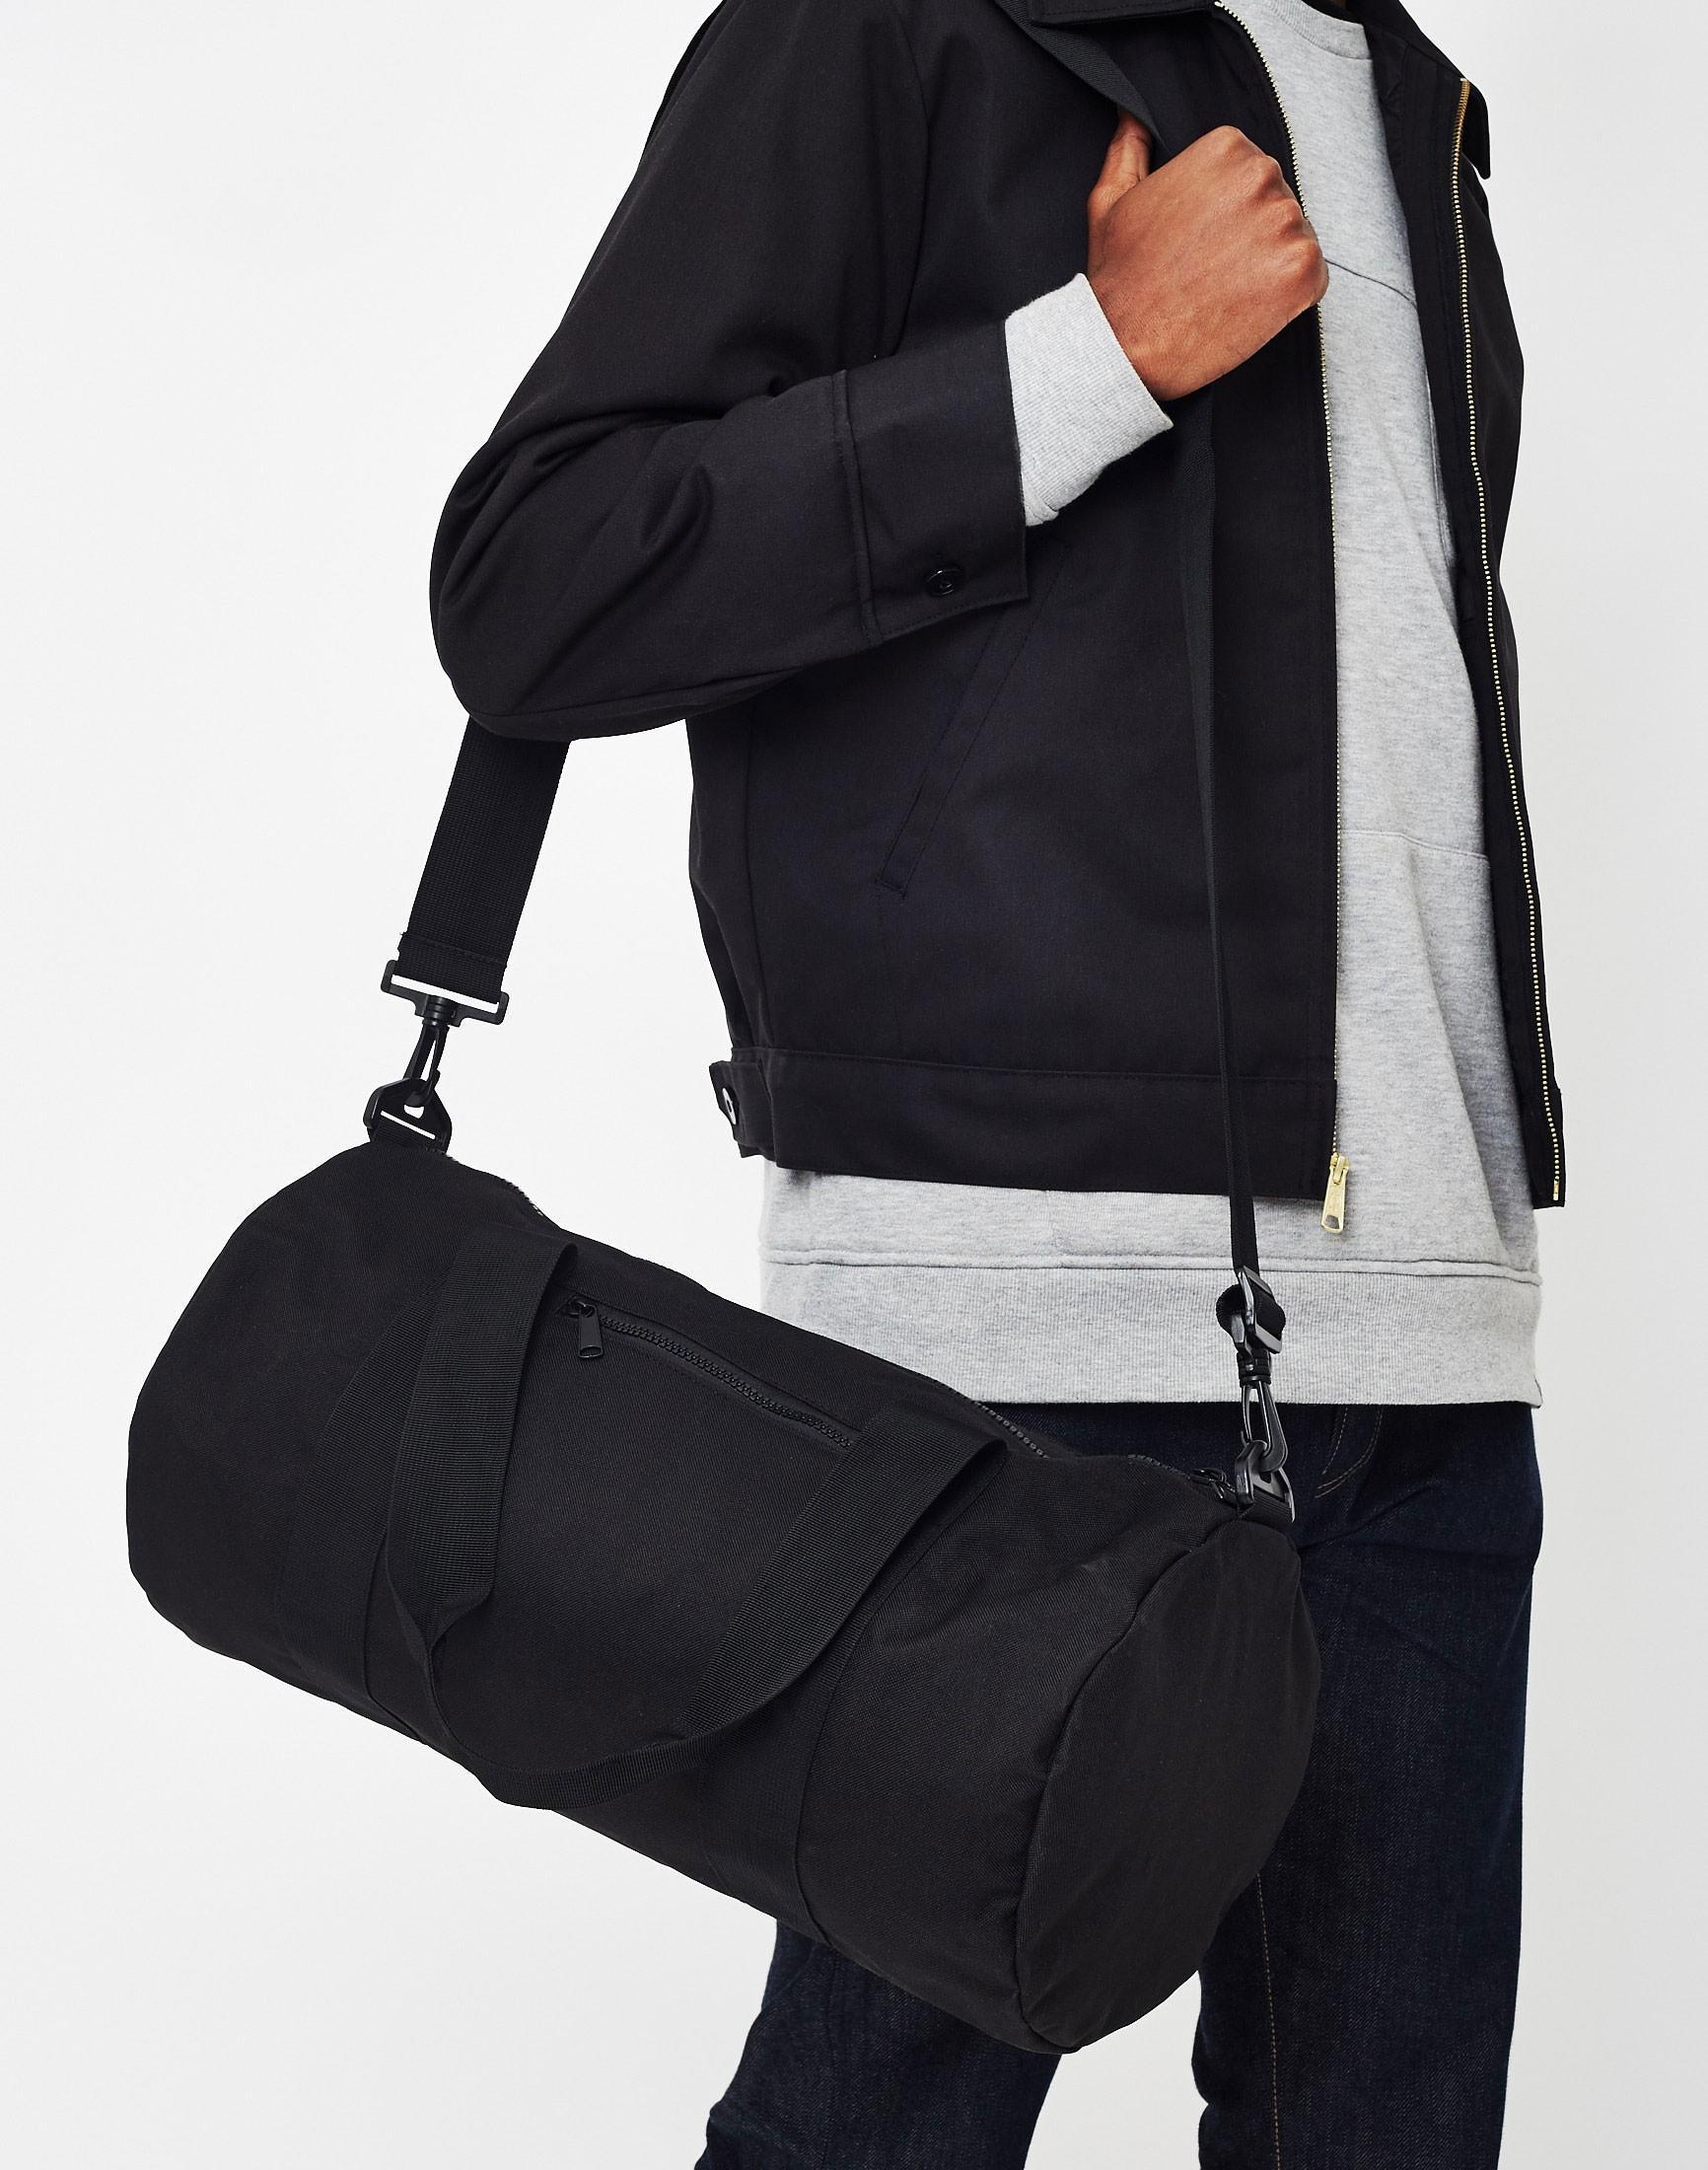 d9eecbd7d7 Lyst - The Idle Man Barrel Bag Black in Black for Men